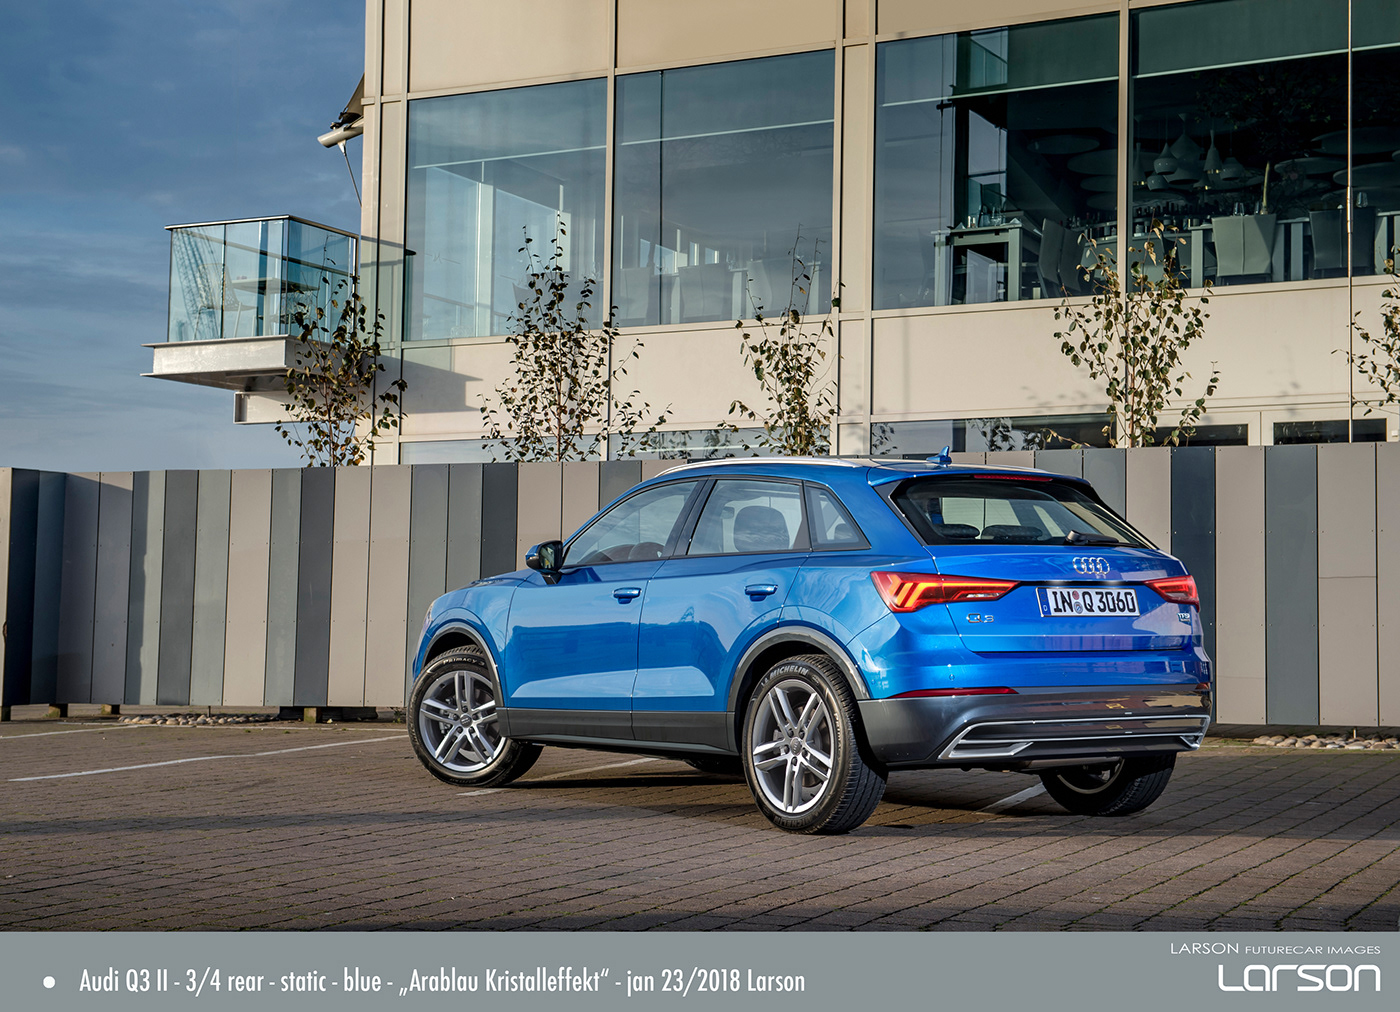 Audi Q Rendering Feb On Behance - Larson audi